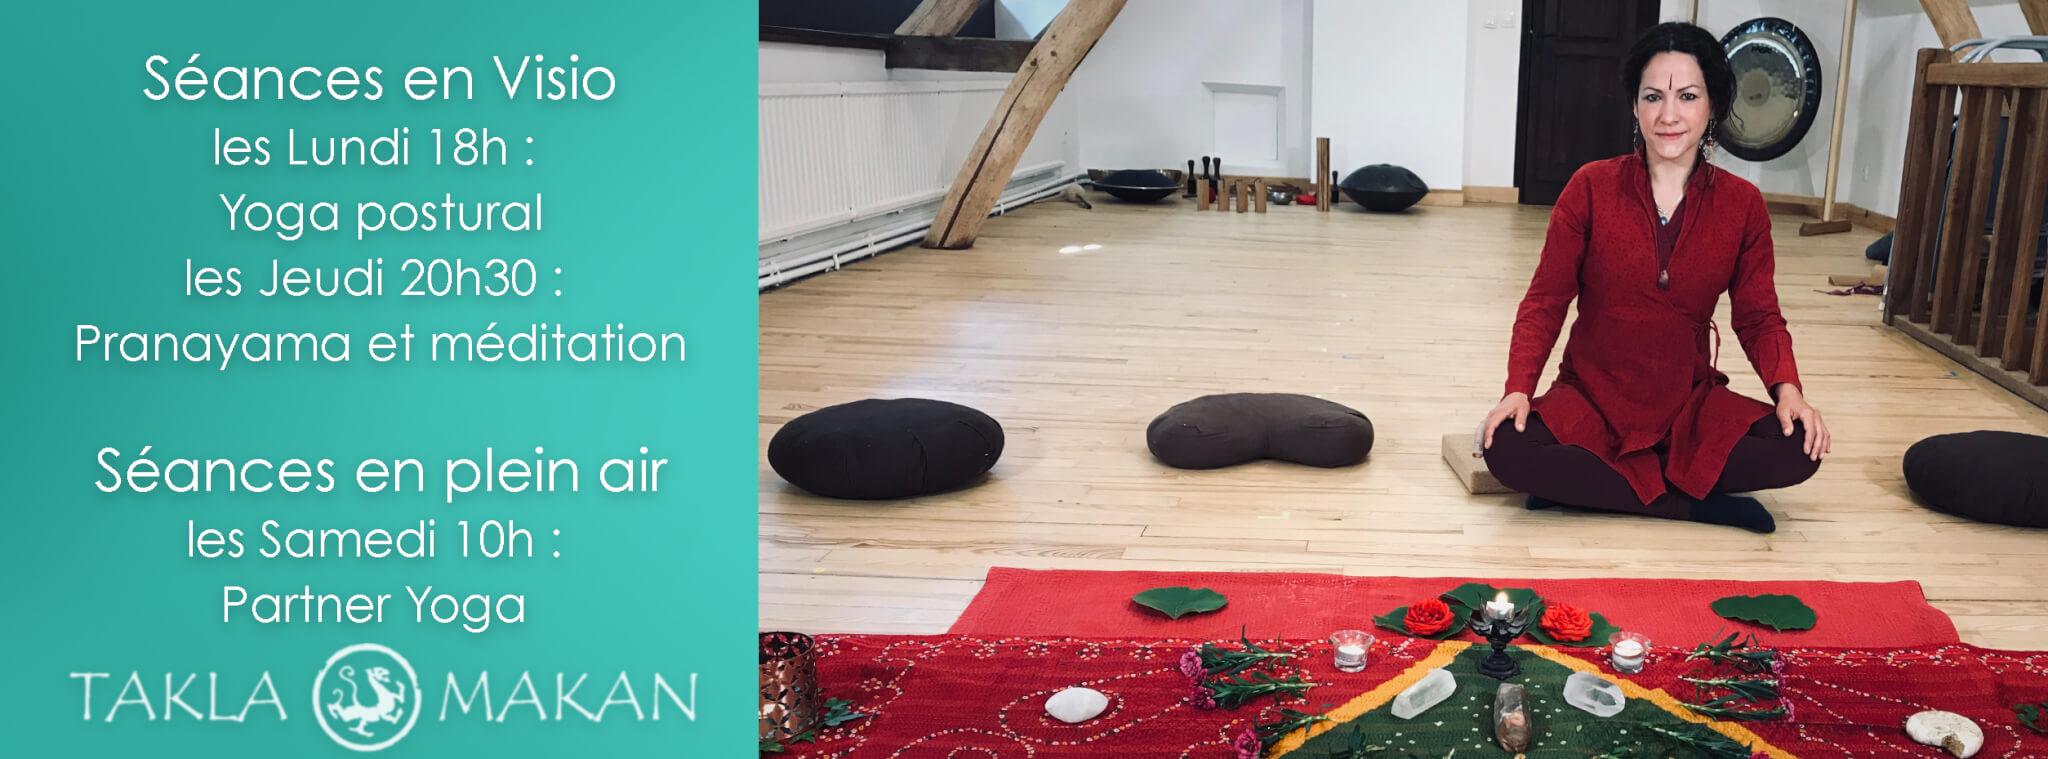 Yoga pranayama meditation avec Melissa